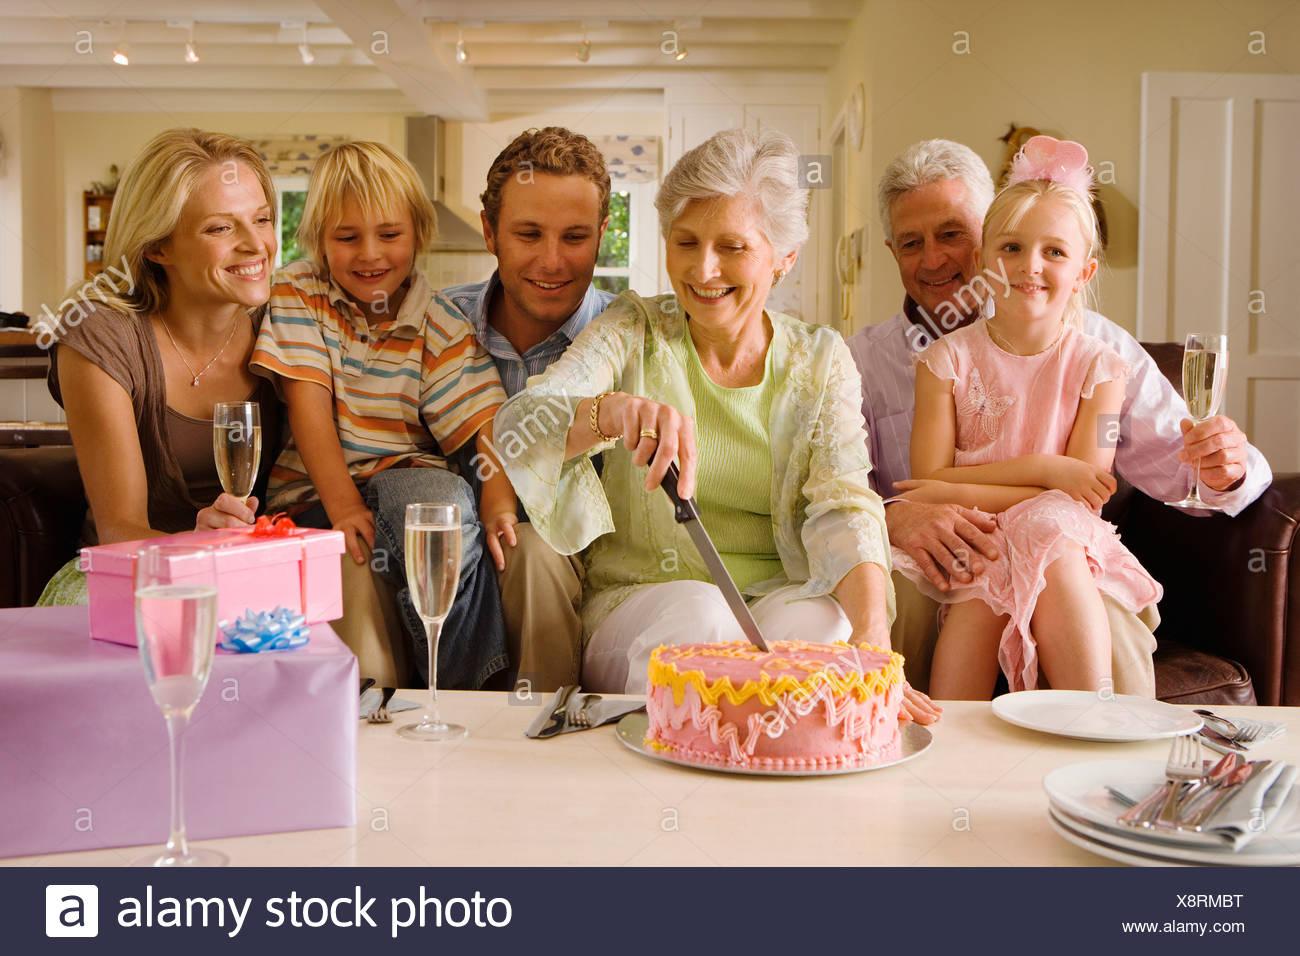 mature woman cutting birthday cake stock photos & mature woman